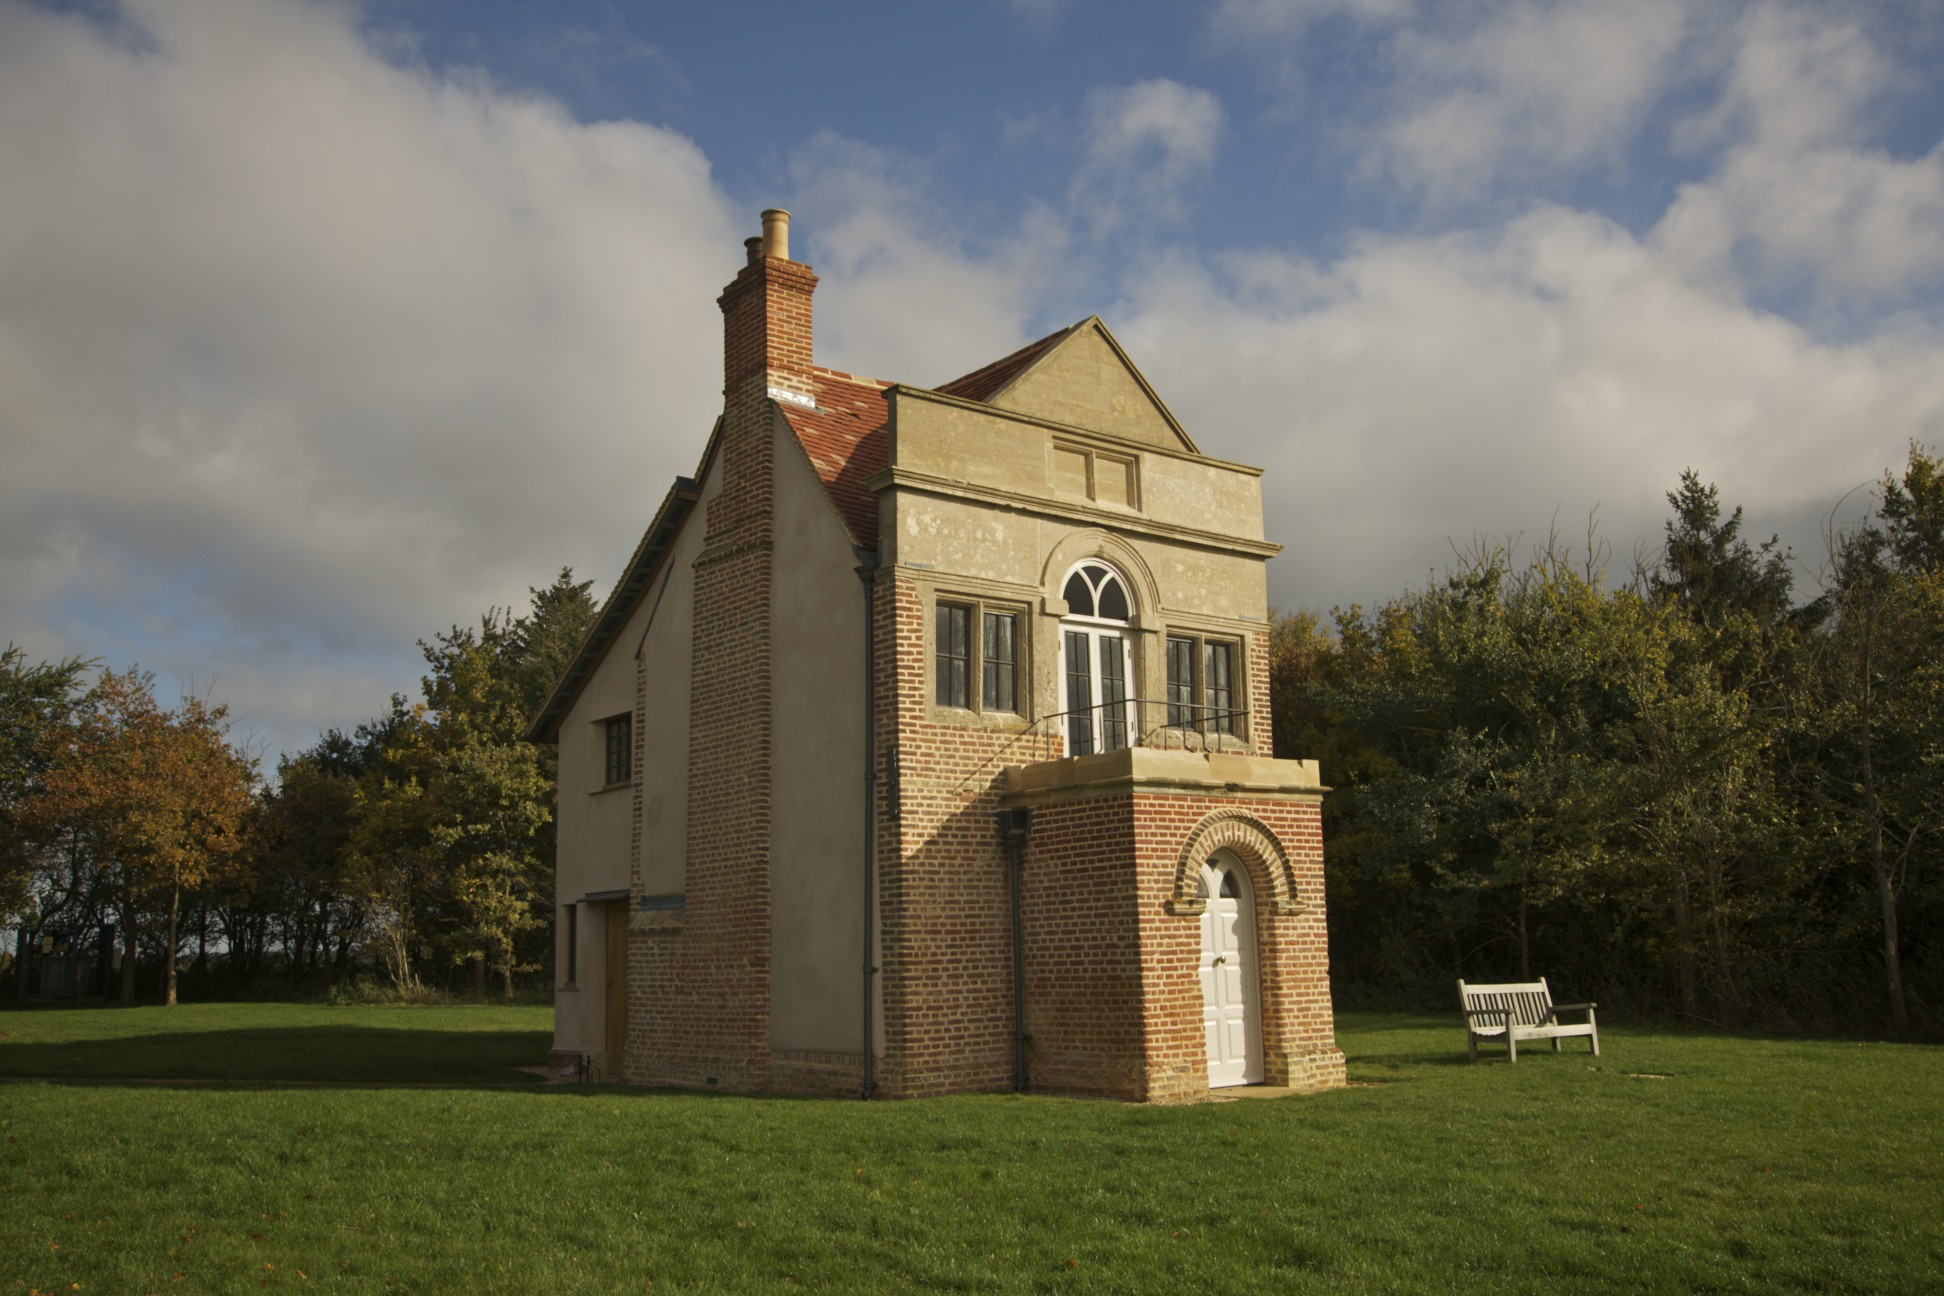 The warren house kimbolton caroe architecture for The warren house